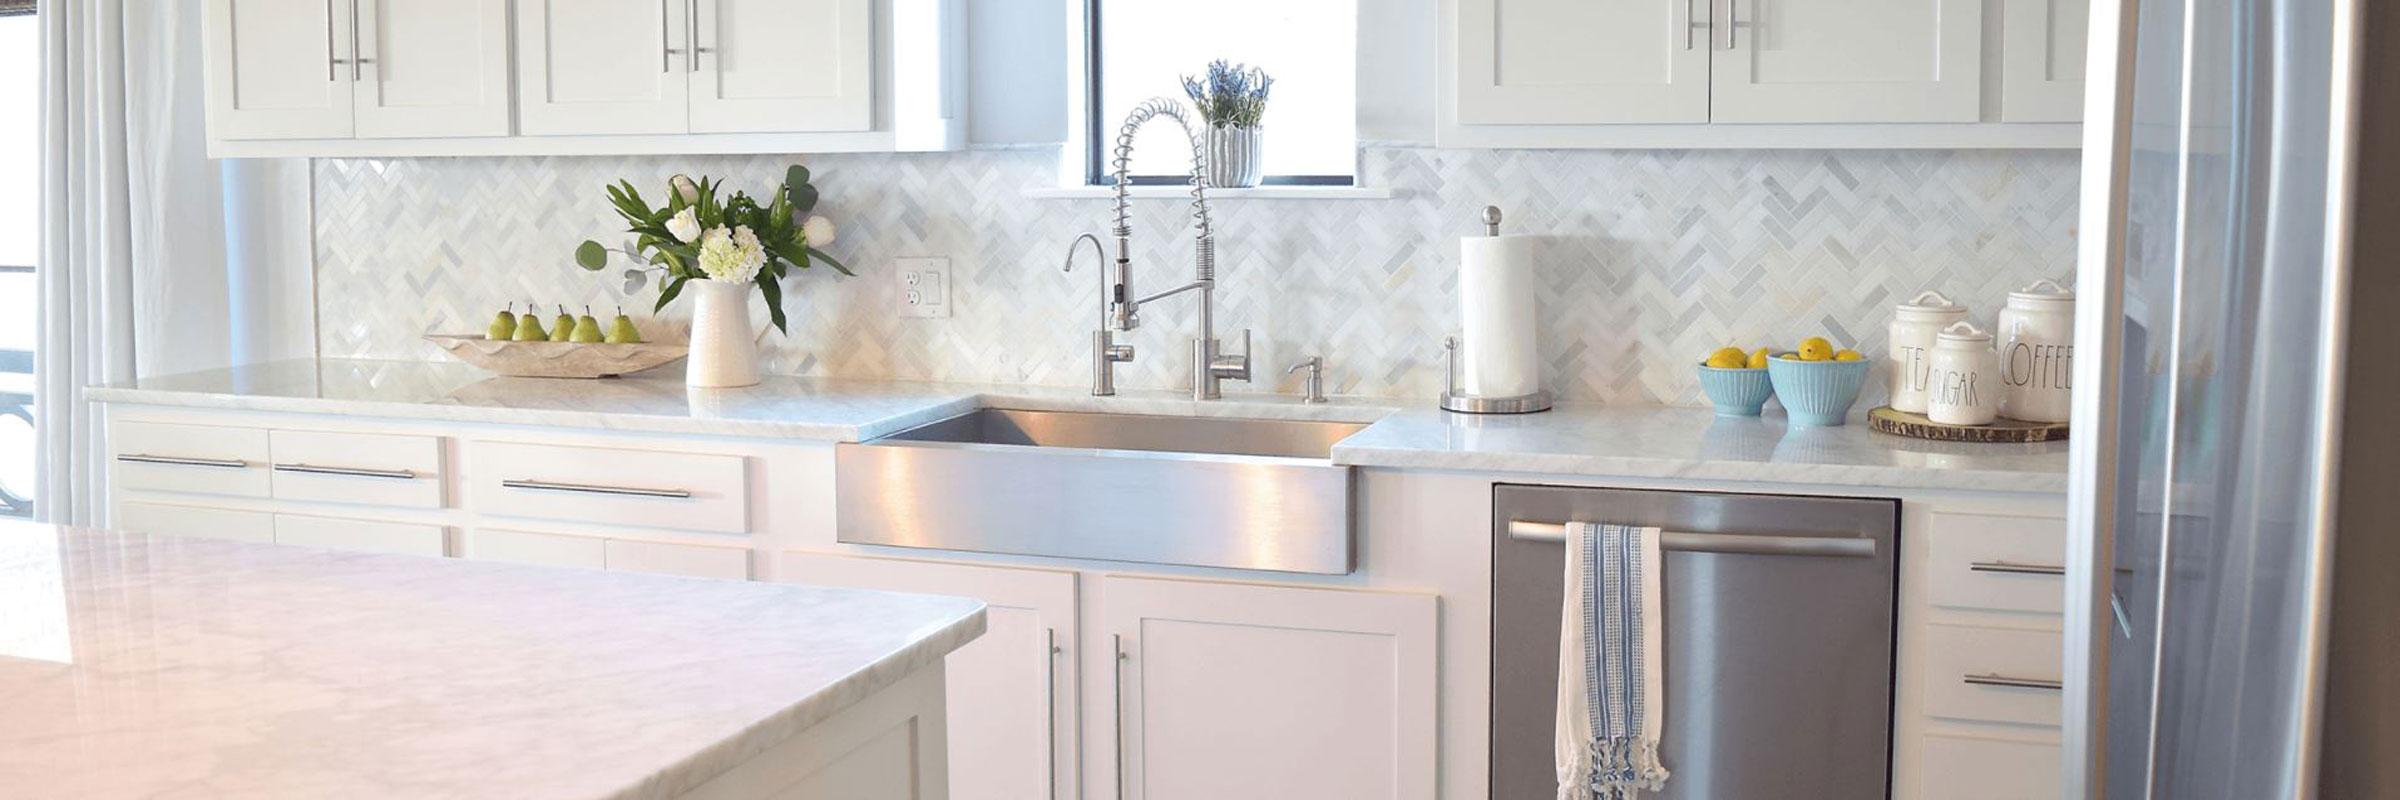 modern-contemporary-white-kitchen-stainless-steel